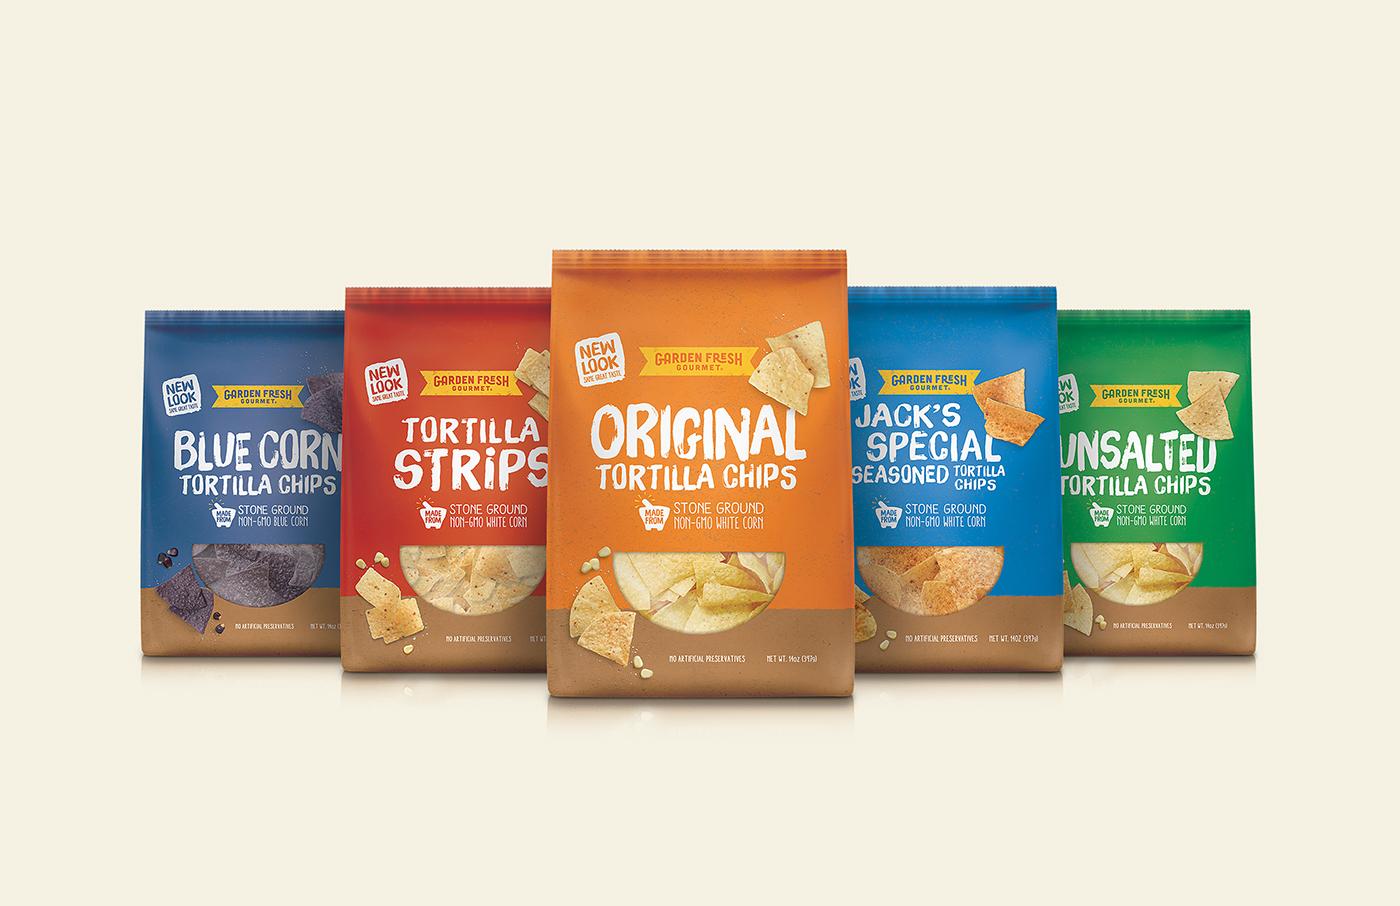 rebrand and packaging design for garden fresh gourmet americas 1 refrigerated salsa brand designed at chase design group - Garden Fresh Gourmet